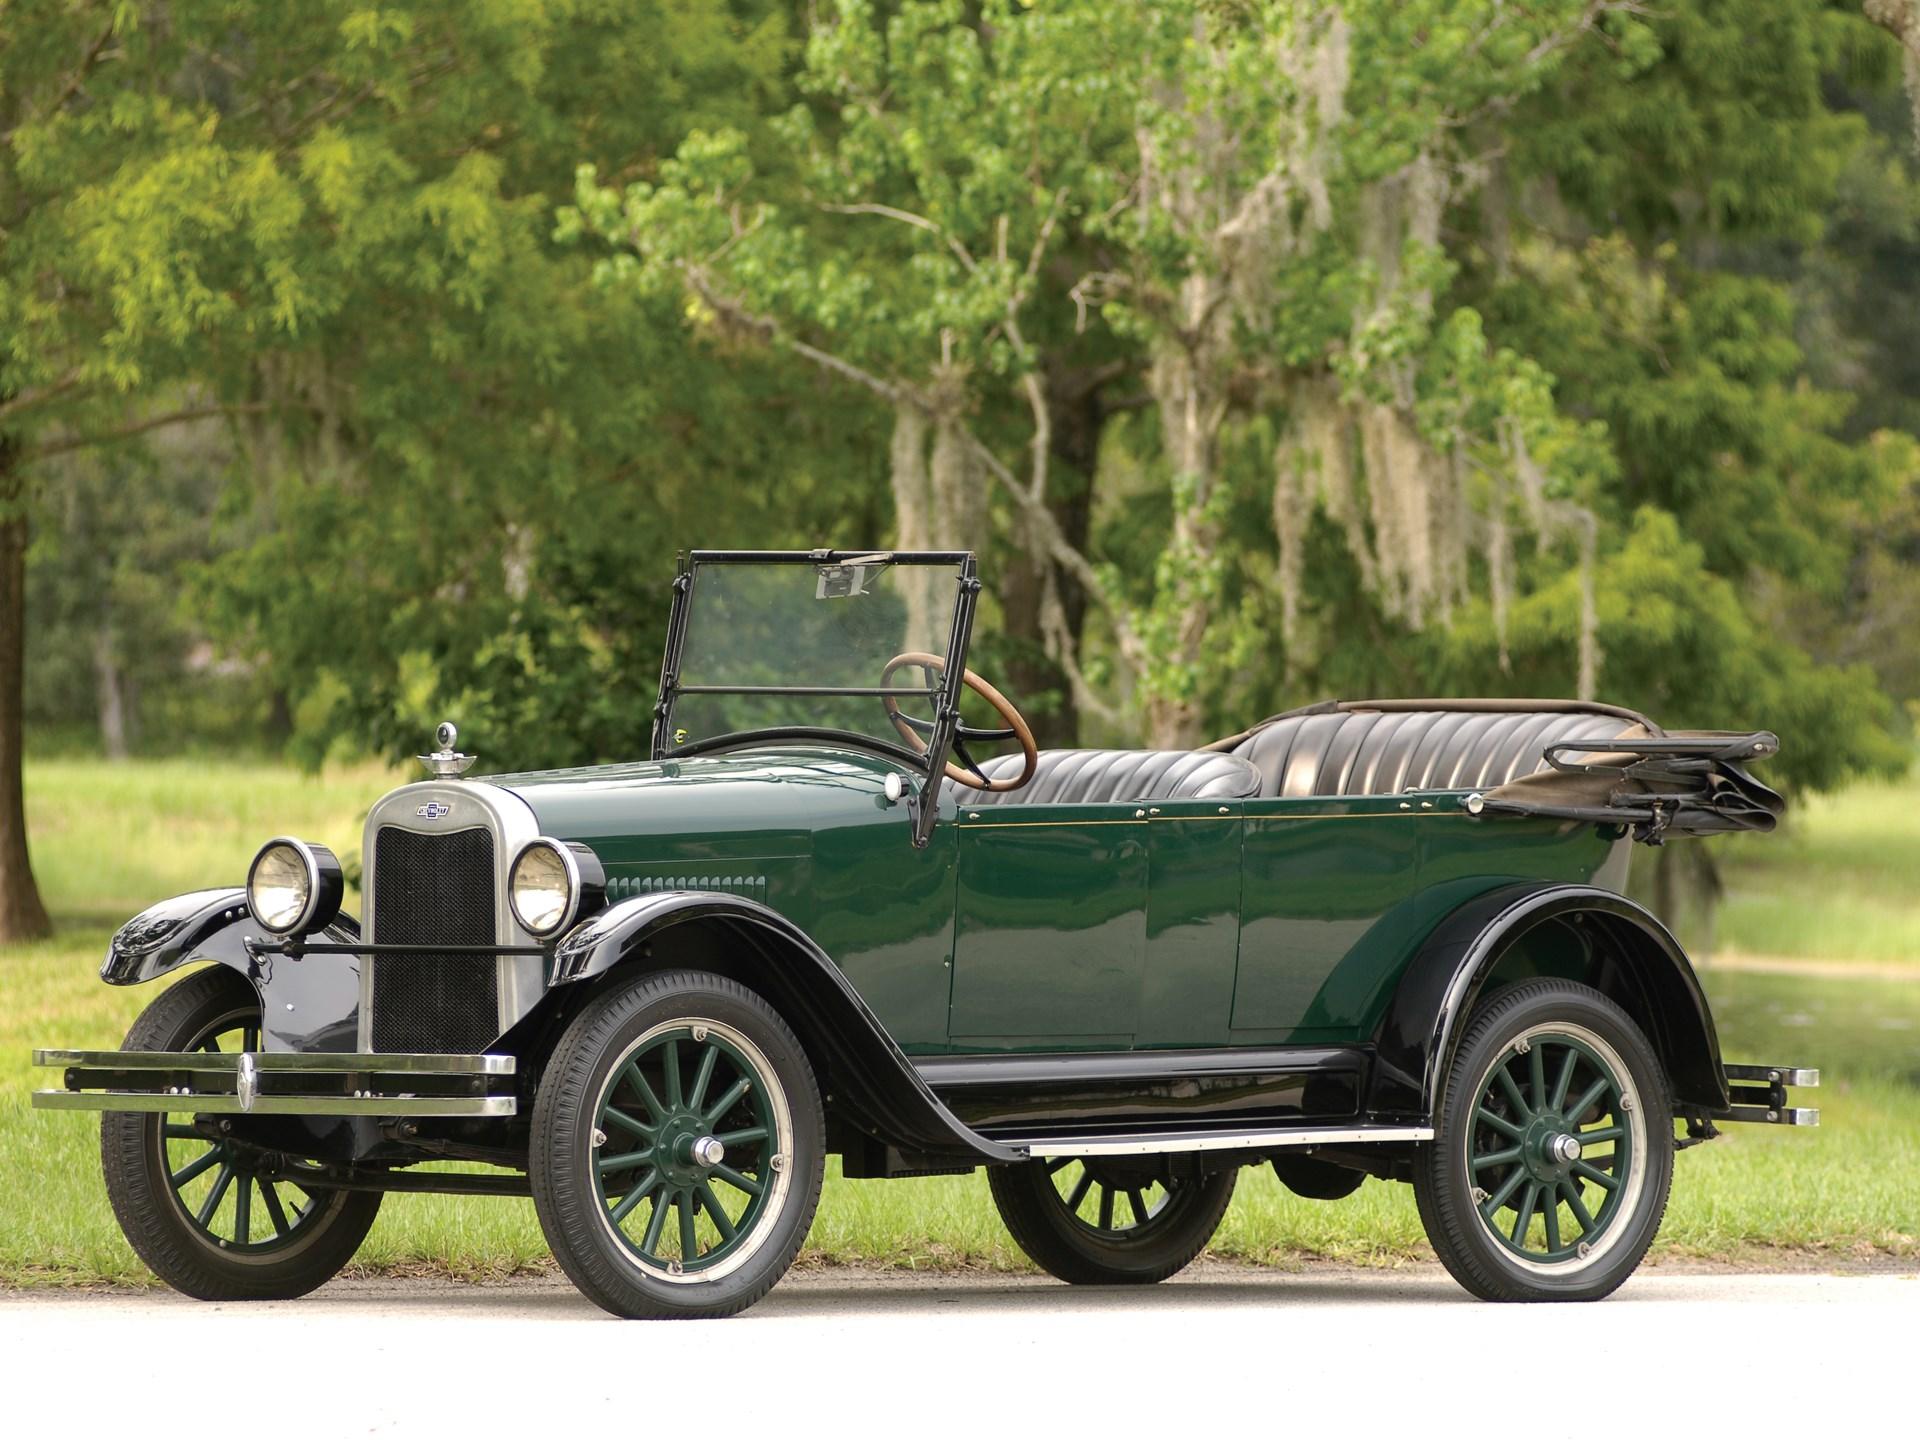 1926 Bentley 3 Litre Weymann Saloon by Gurney Nutting SOLD